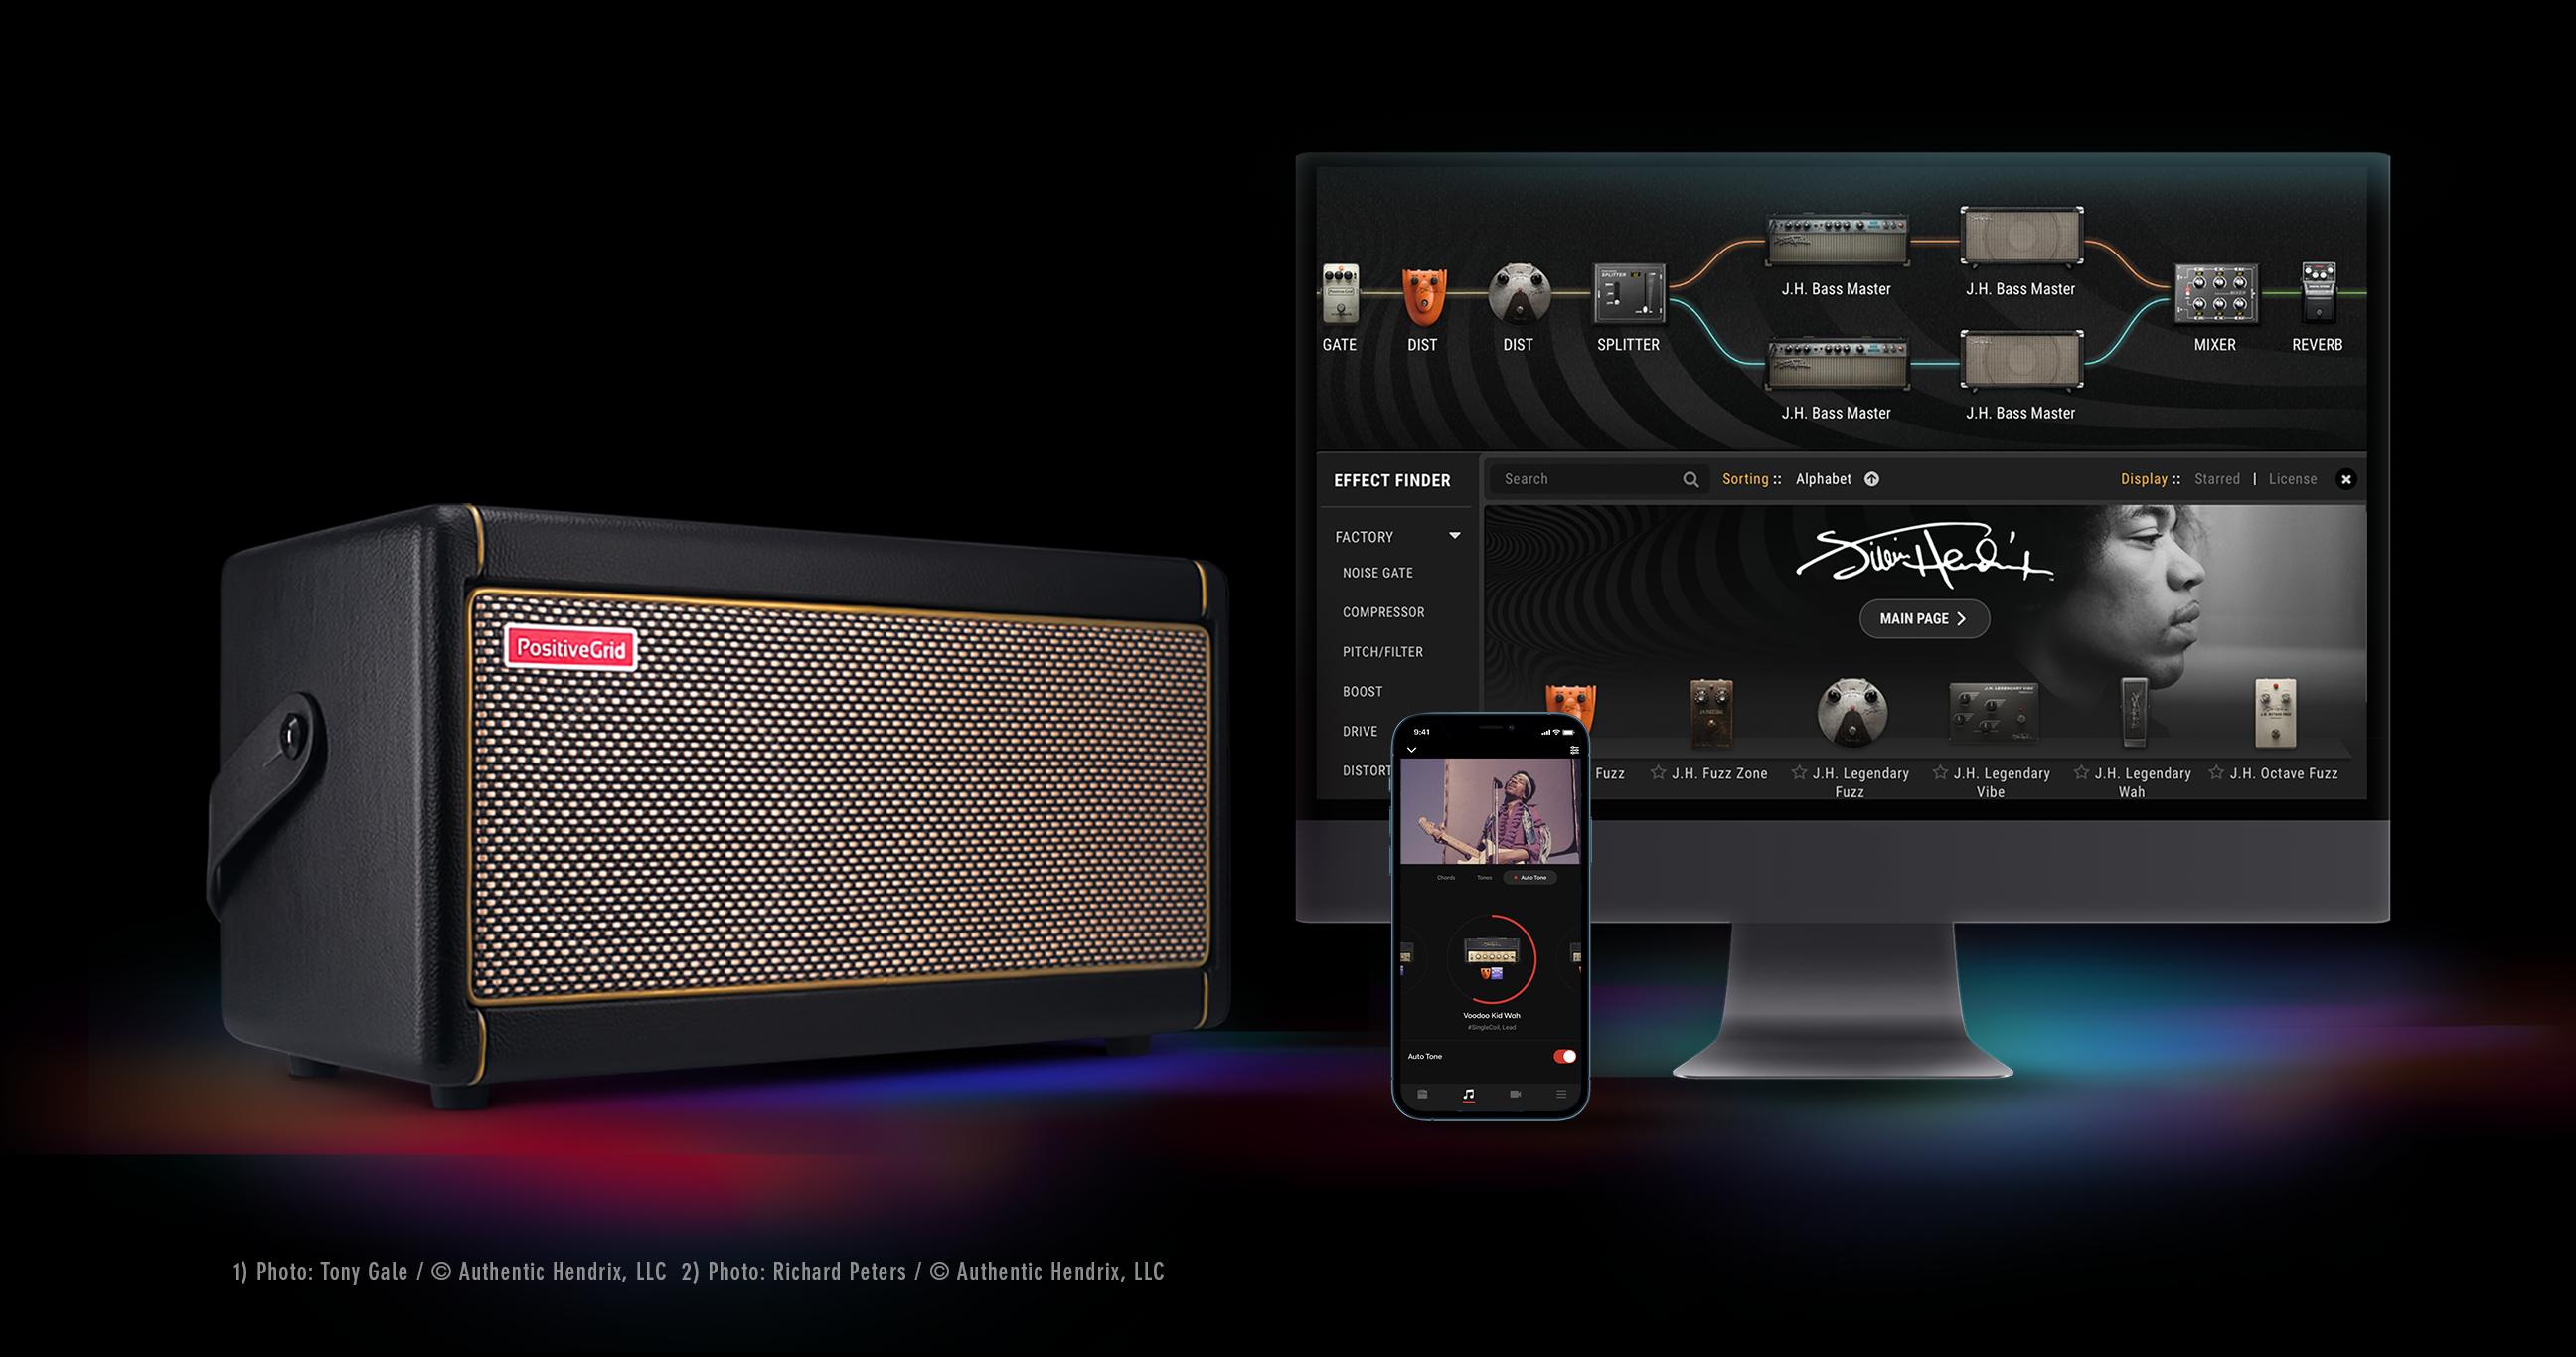 Positive Grid Announces Experience Jimi Hendrix Official Gear Collection -  Premier Guitar